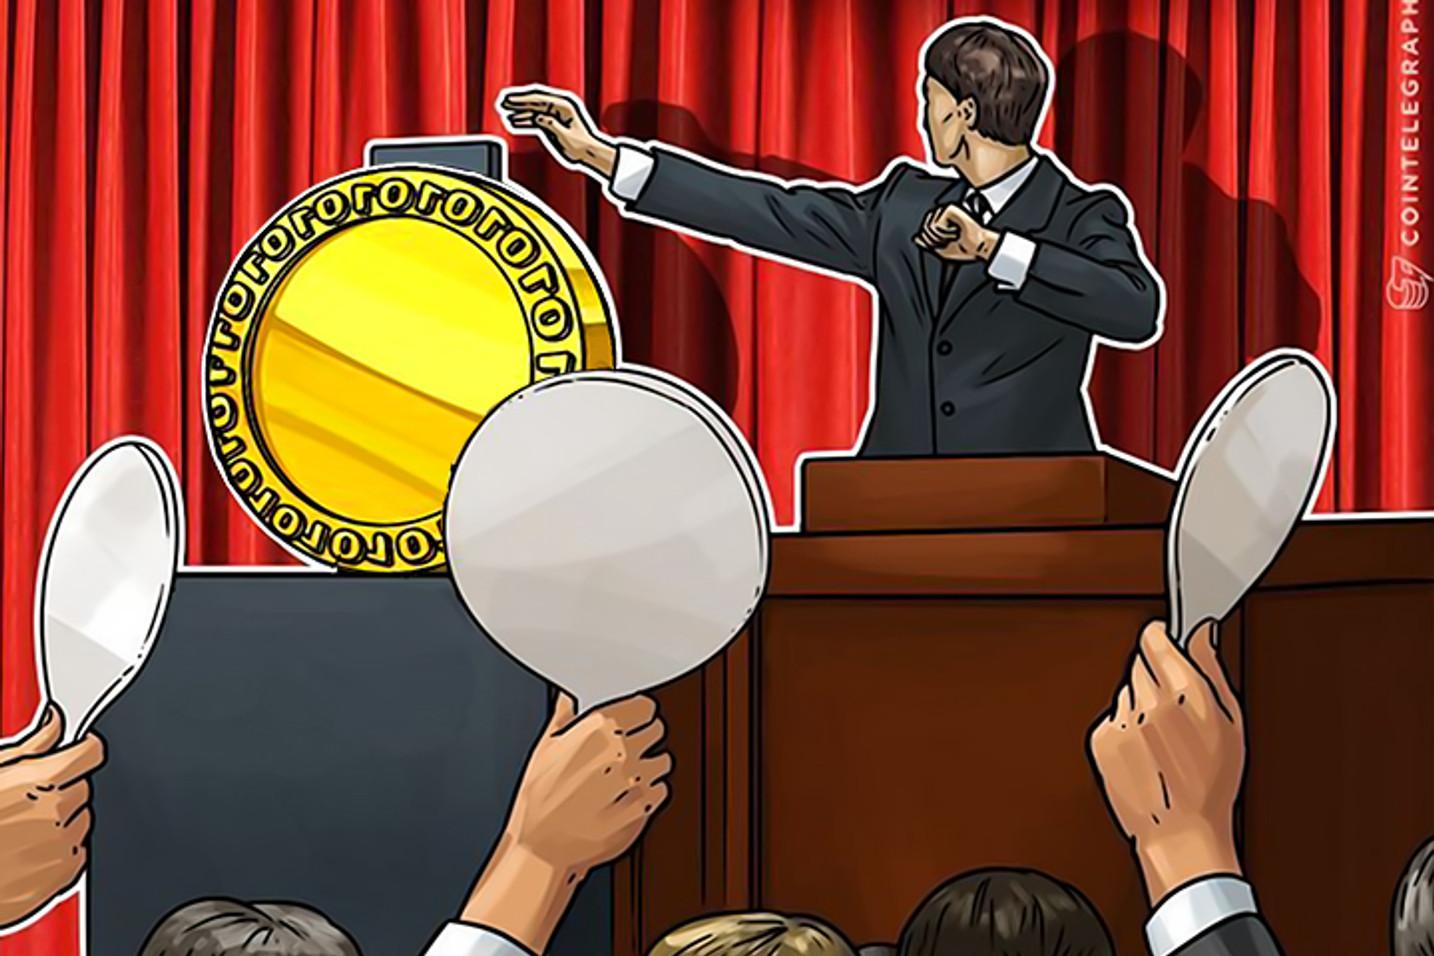 AICoin Promete aos Investidores Apoio à Inteligência Artificial e Negociações nas Top Criptos